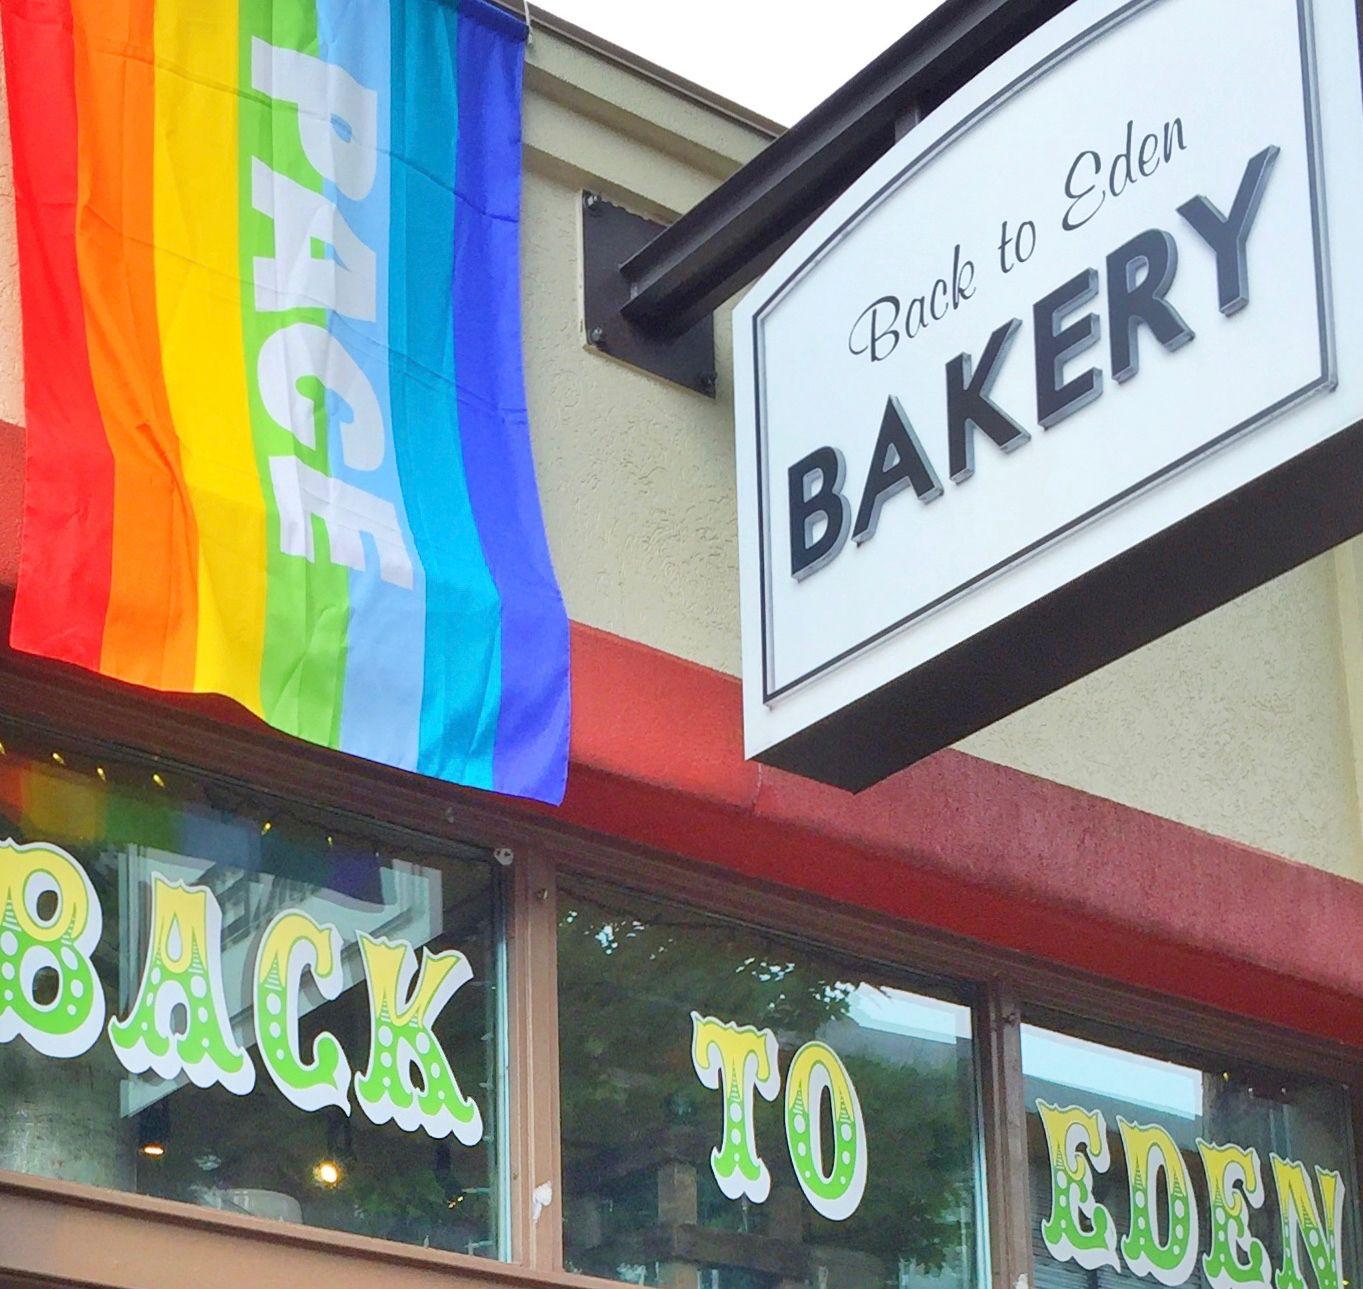 Bakery Portland, OR Bakery, Portland, Free food